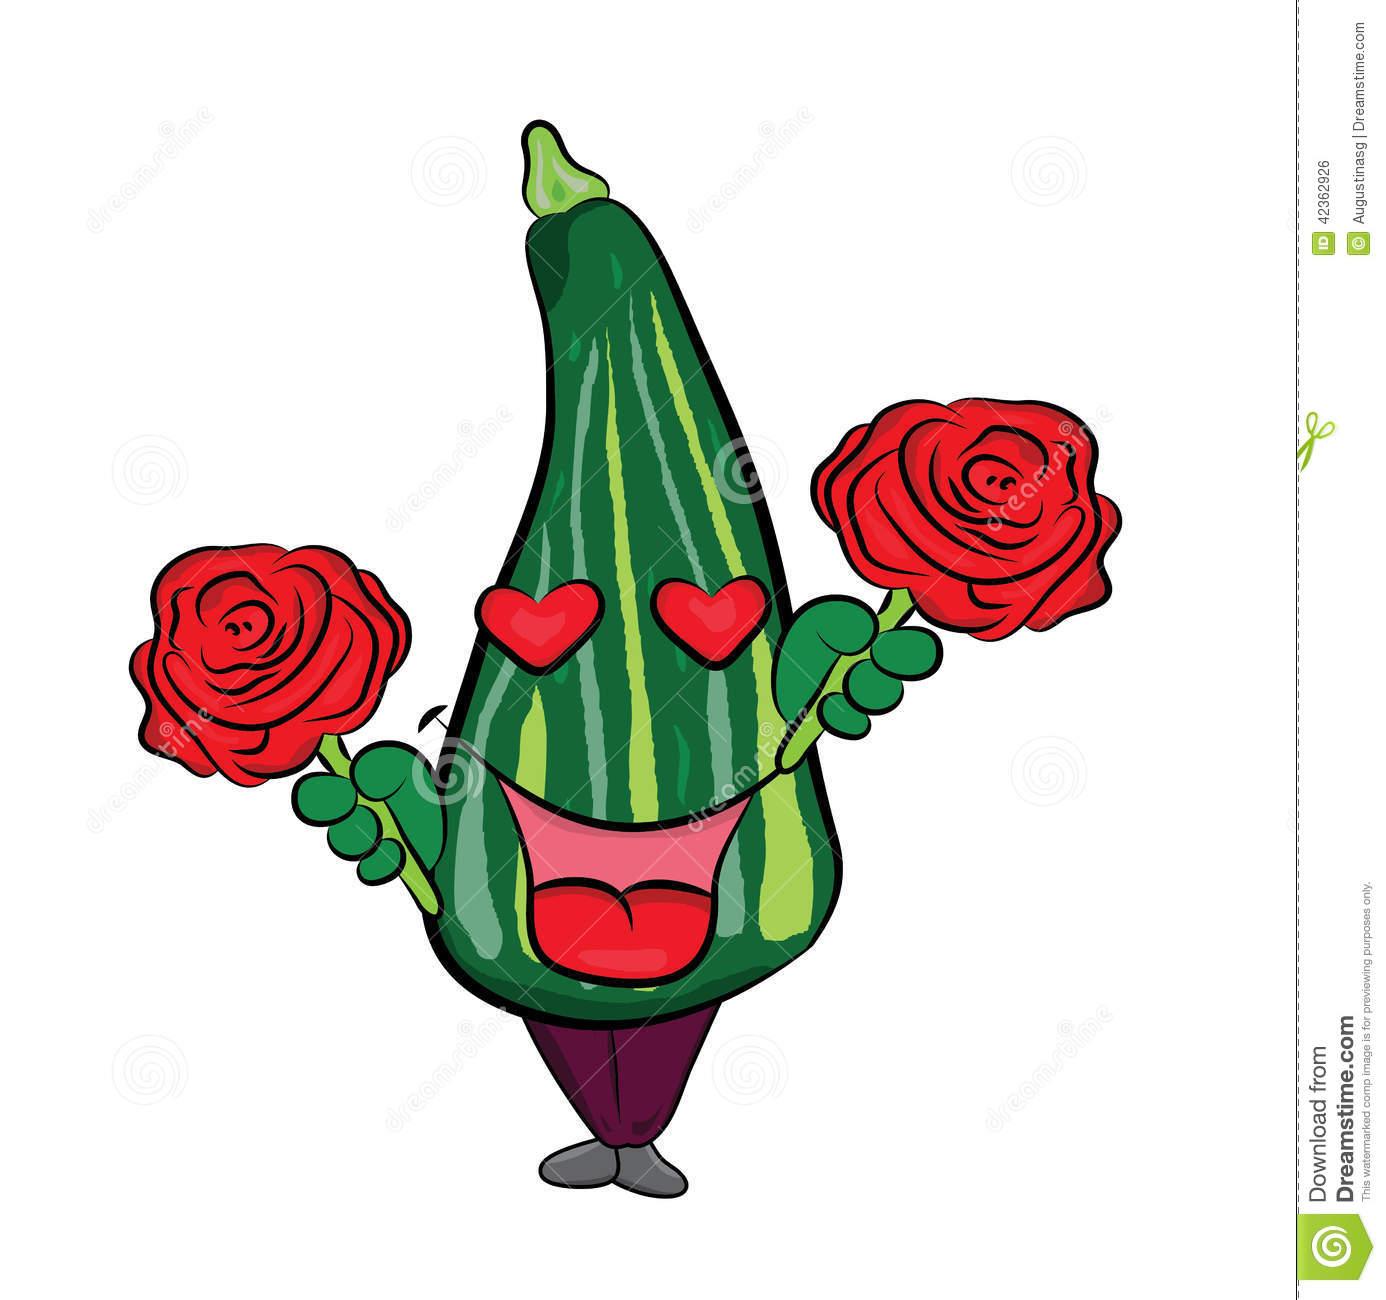 Zucchini character clipart clipart black and white stock Cartoon Happy Zucchini Character Royalty Free Stock Photos - Image ... clipart black and white stock